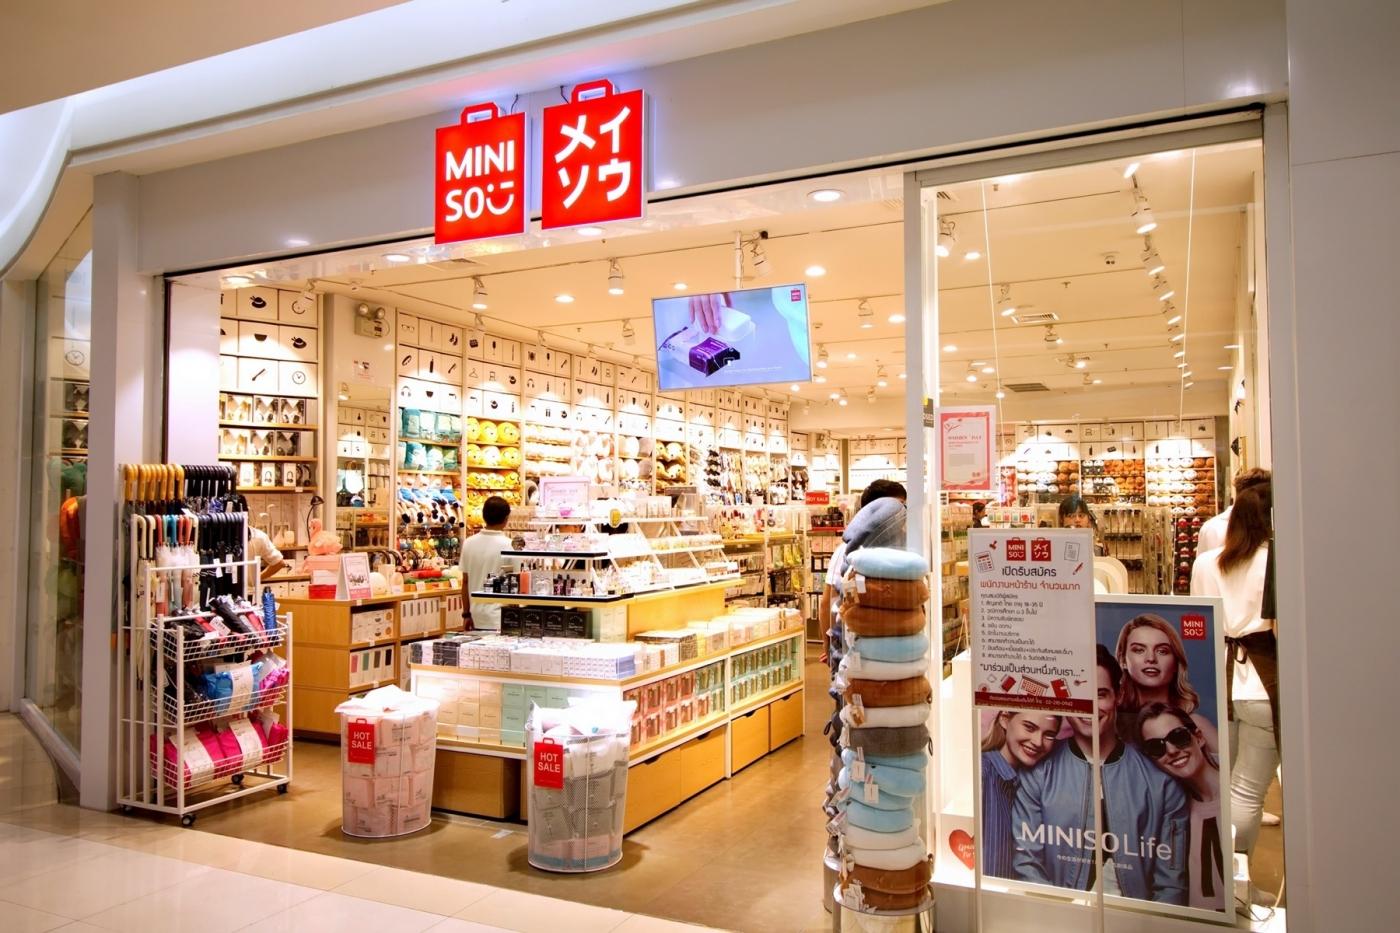 MINISO將上市!這間中國起家的街頭雜貨店,如何靠IP聯名翻轉品牌山寨形象?